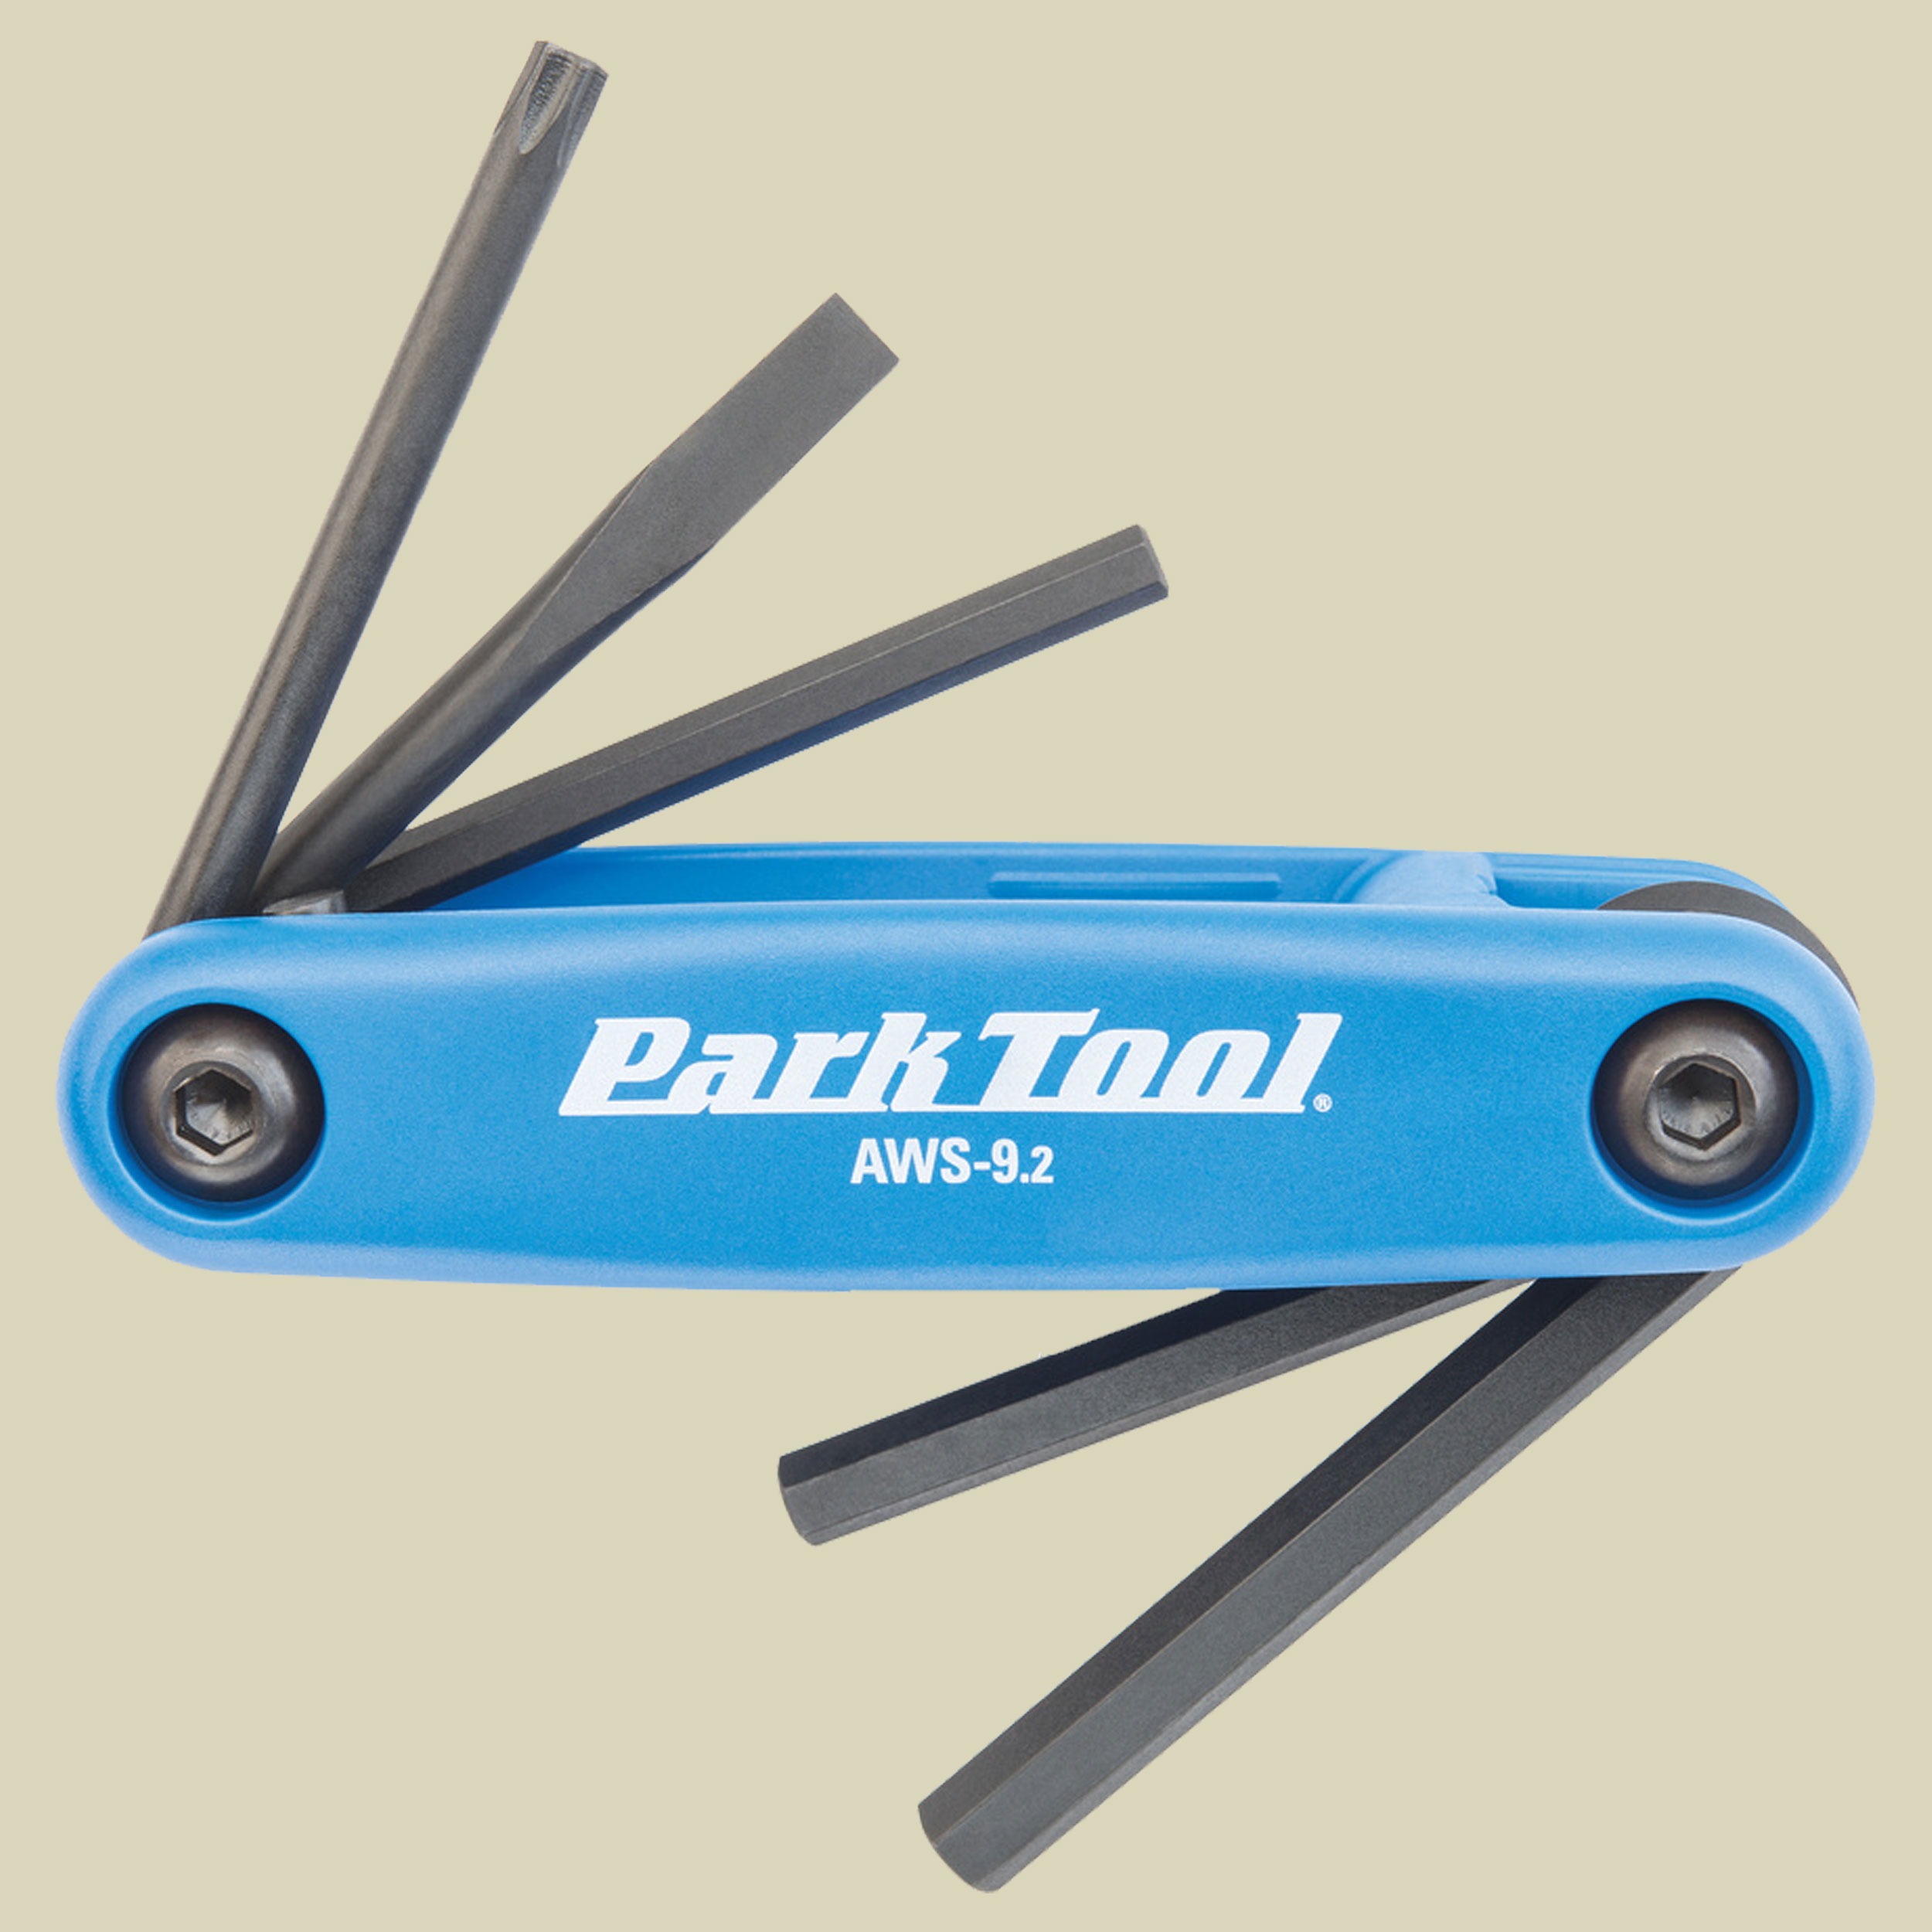 Park Tool AWS-9.2 Faltwerkzeug / Minitool Faltwerkzeug